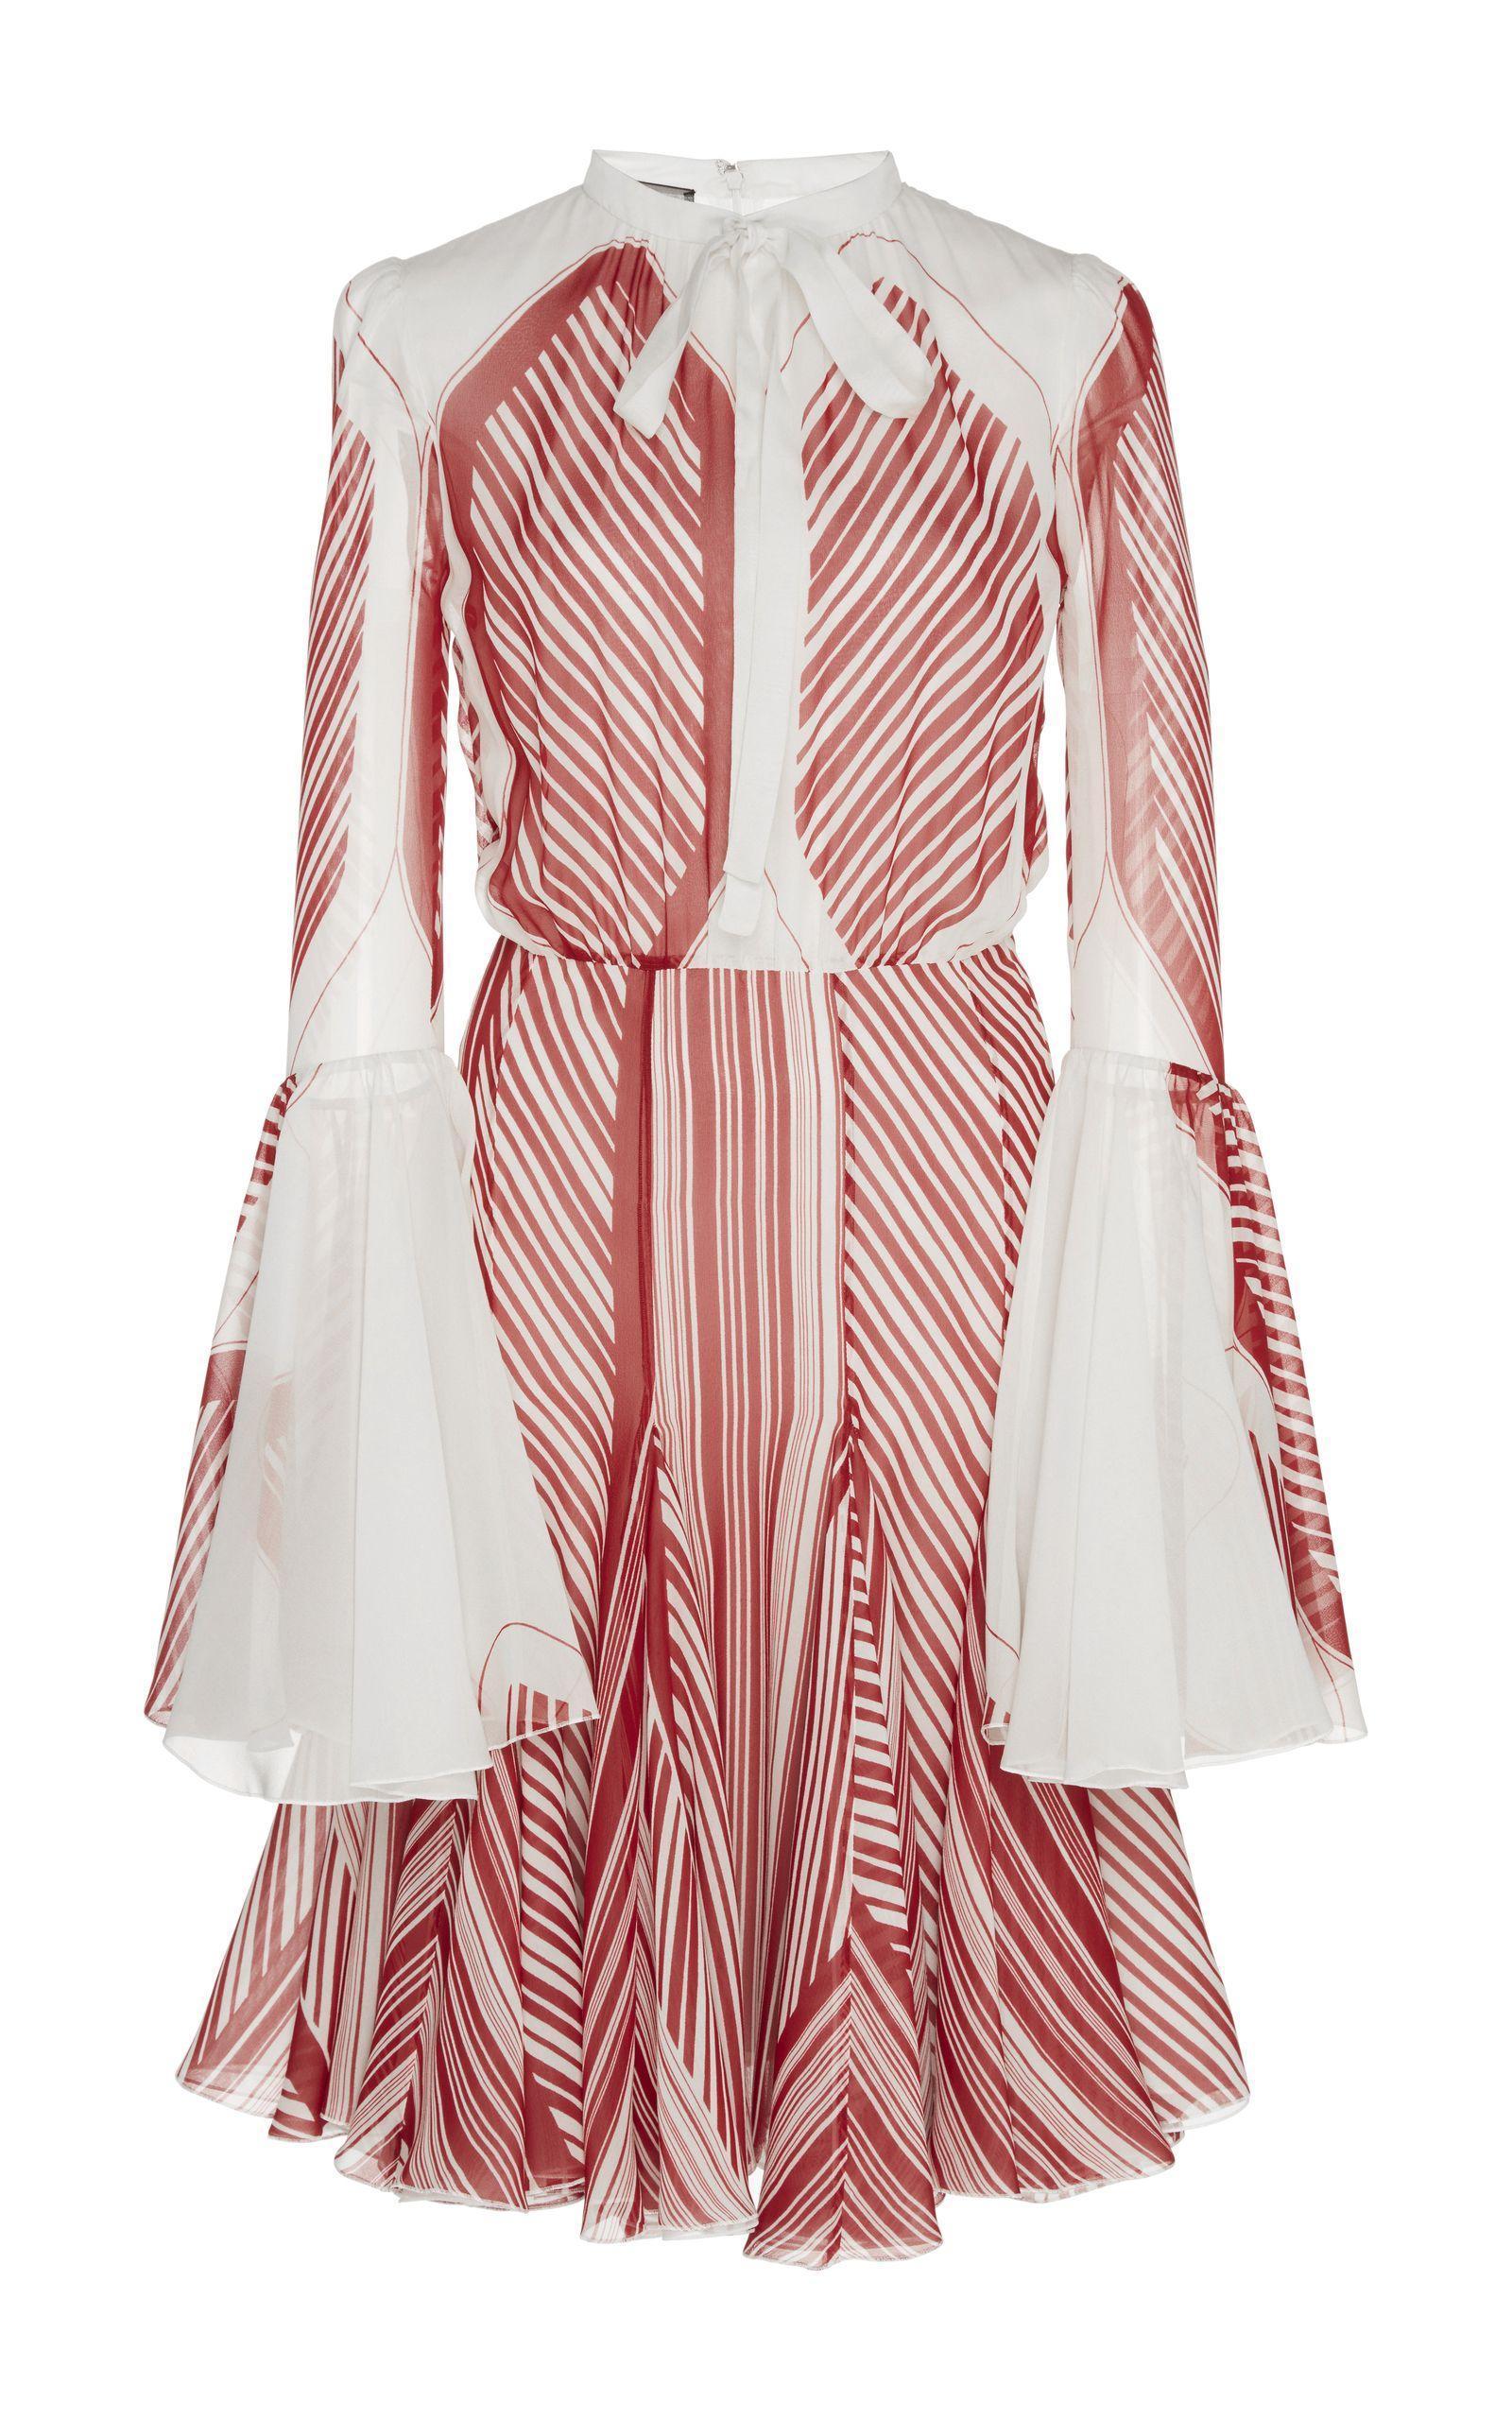 Striped cocktail dress by giambattista valli for preorder on moda